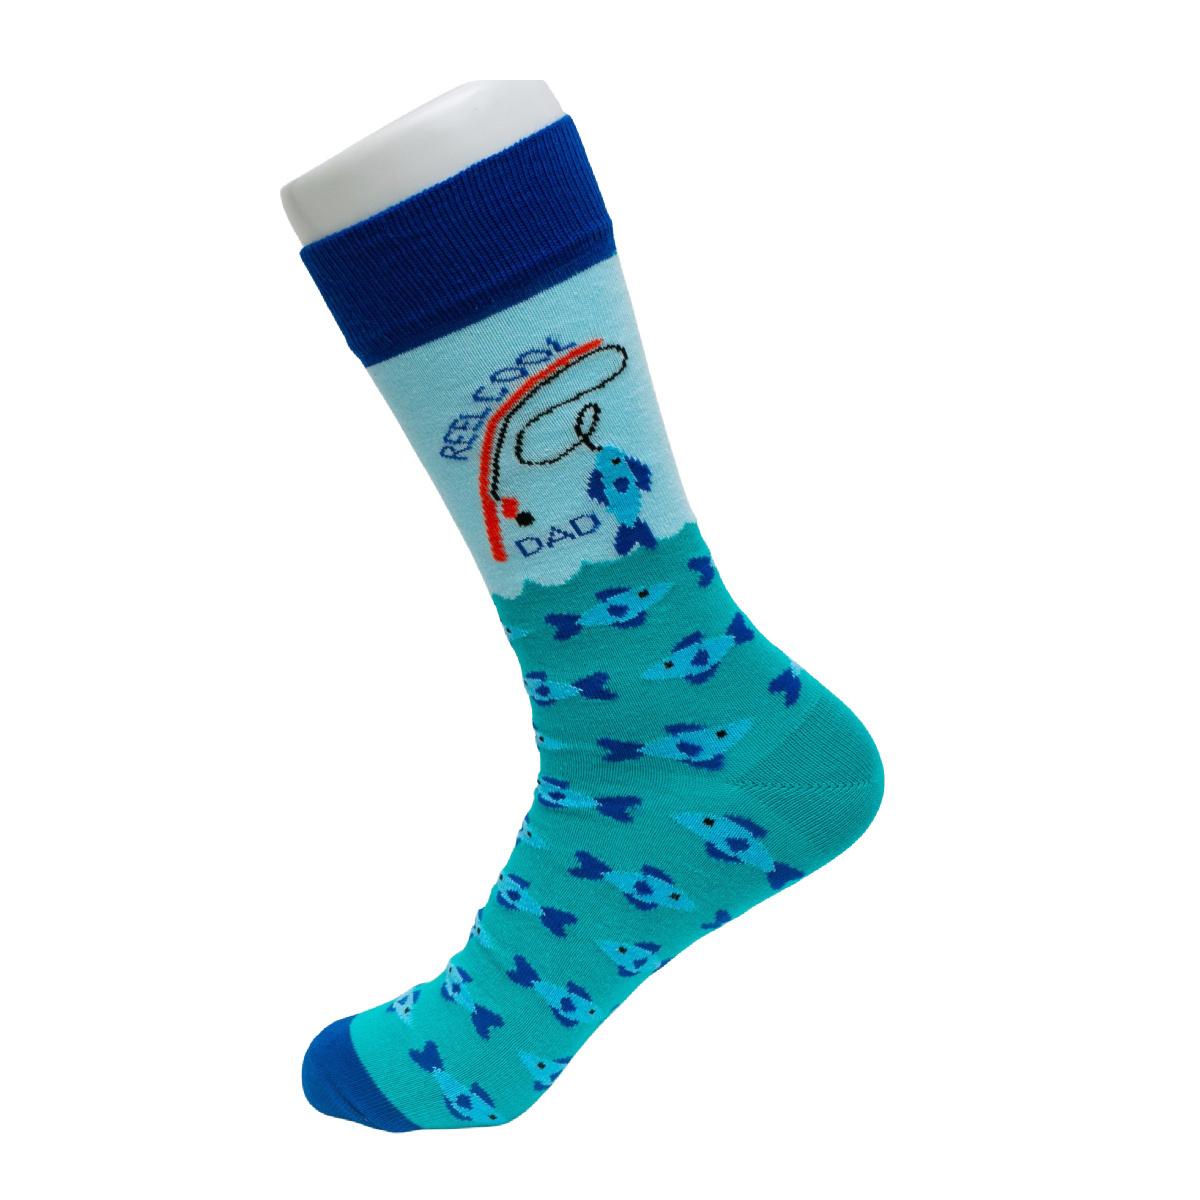 Socks Atomica Socks Atomica Reel Cool Dad